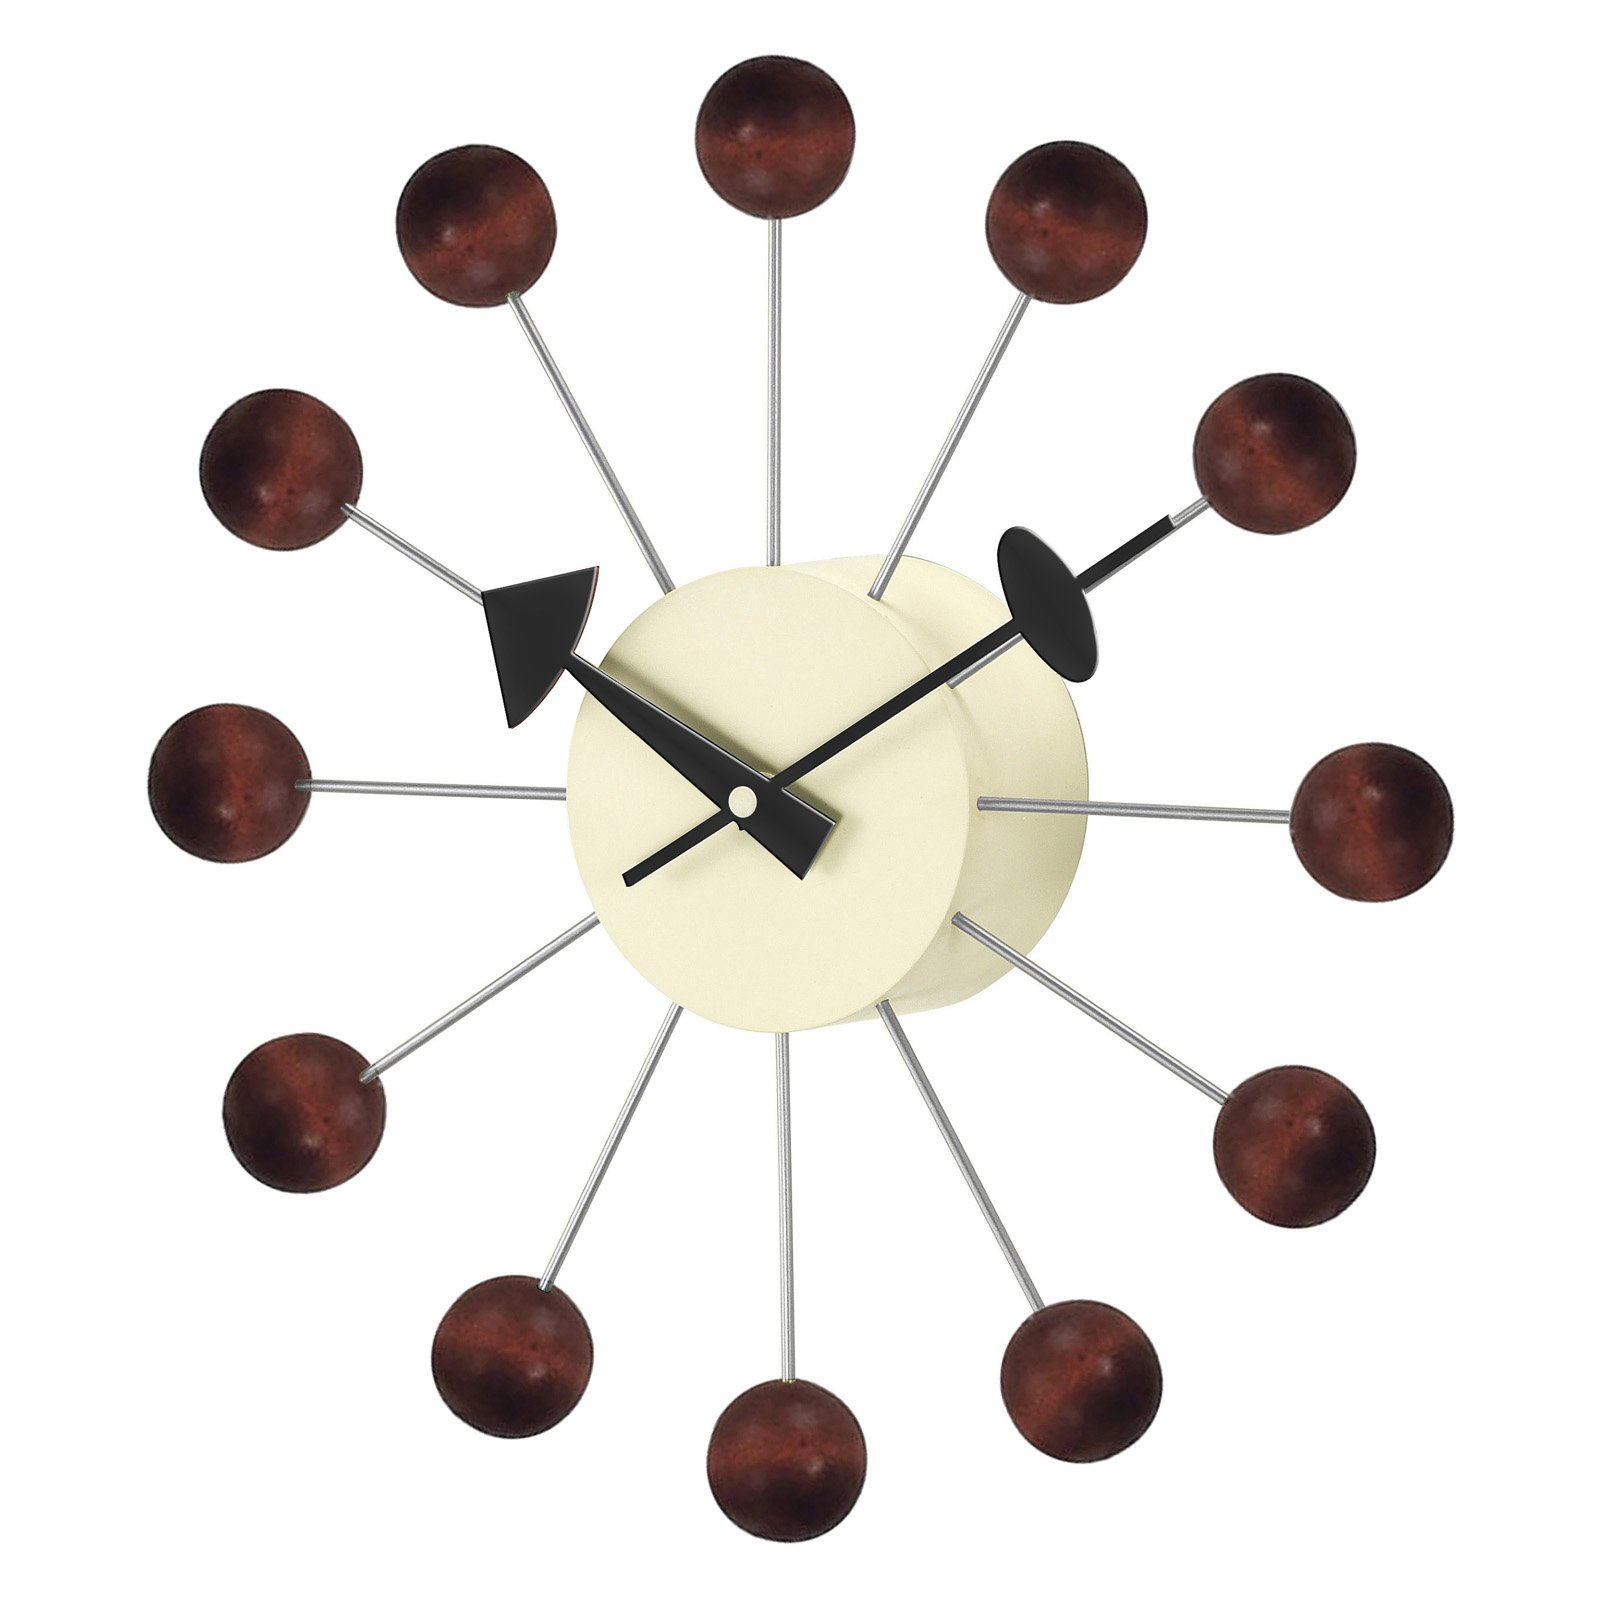 George Nelson Ball 13 in. Wall Clock - Walnut